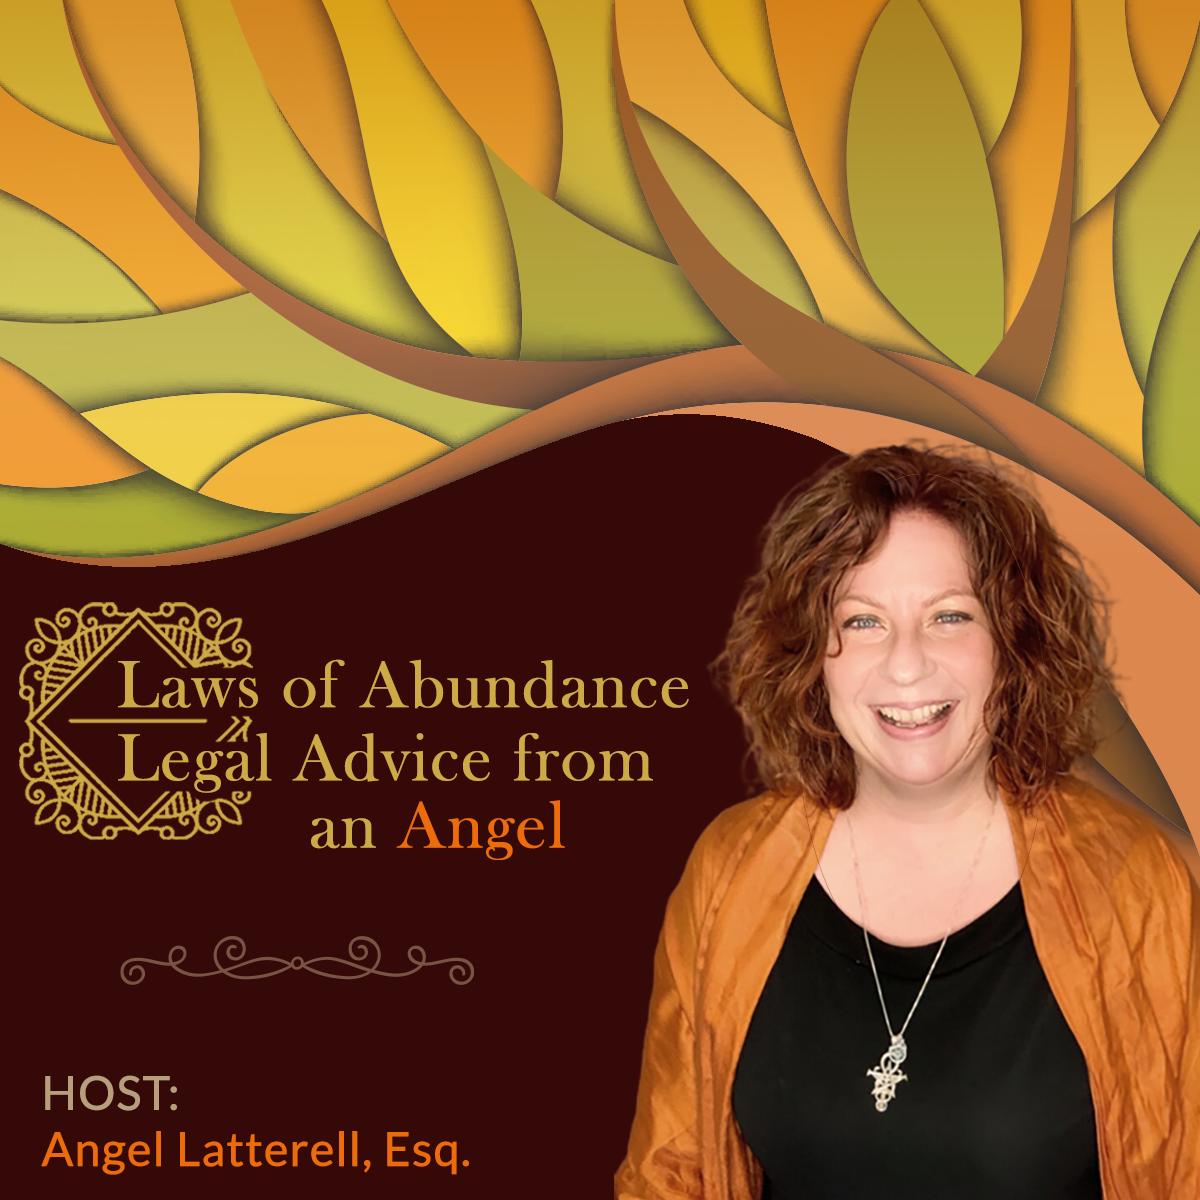 Laws of Abundance: Legal Advice from an Angel